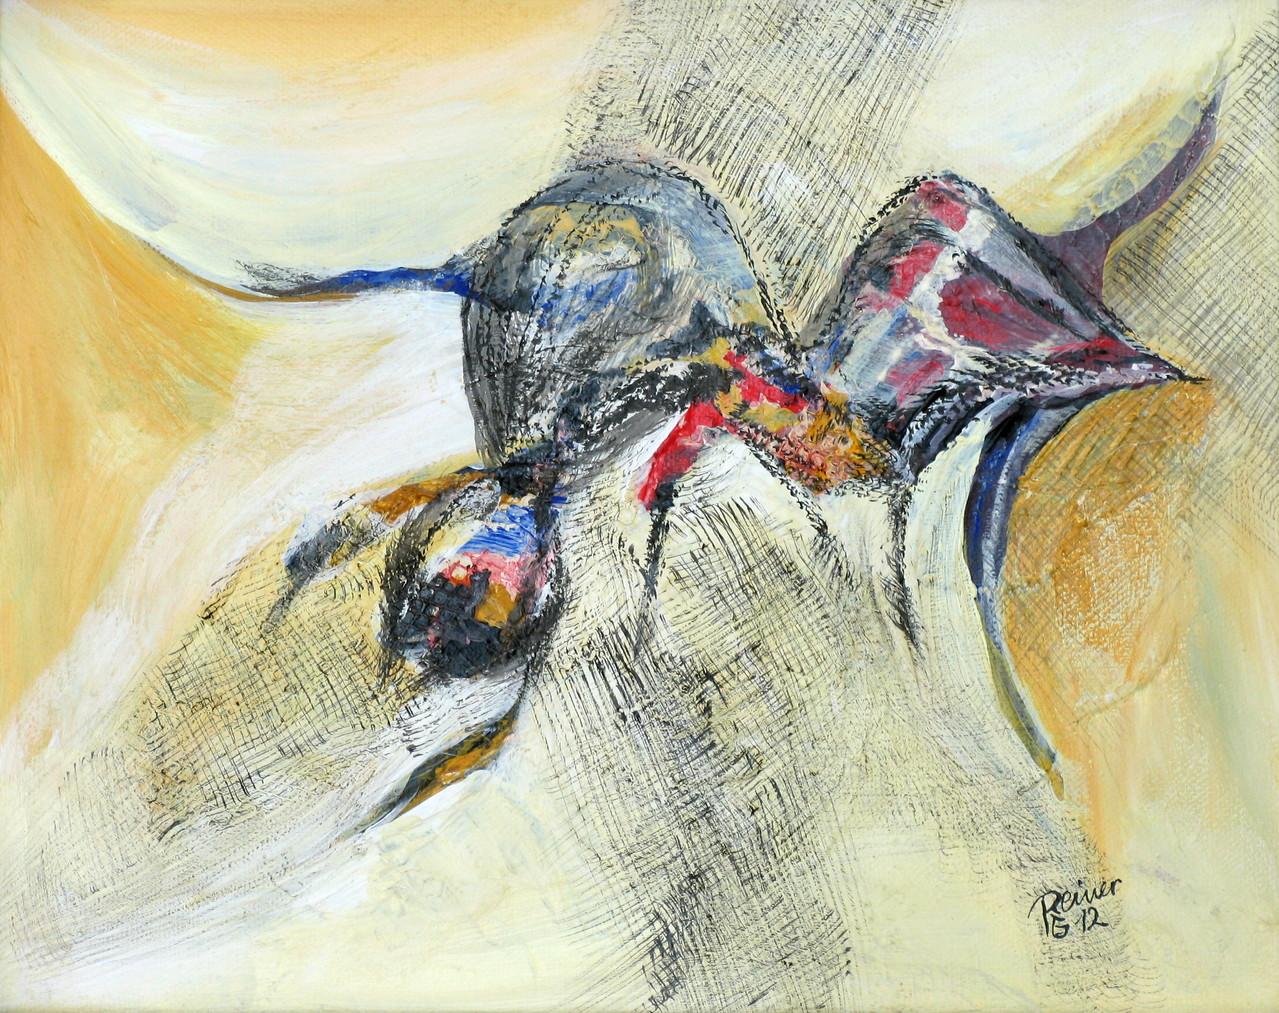 o.T., Acryl auf Leinwand, 24 x 30 cm